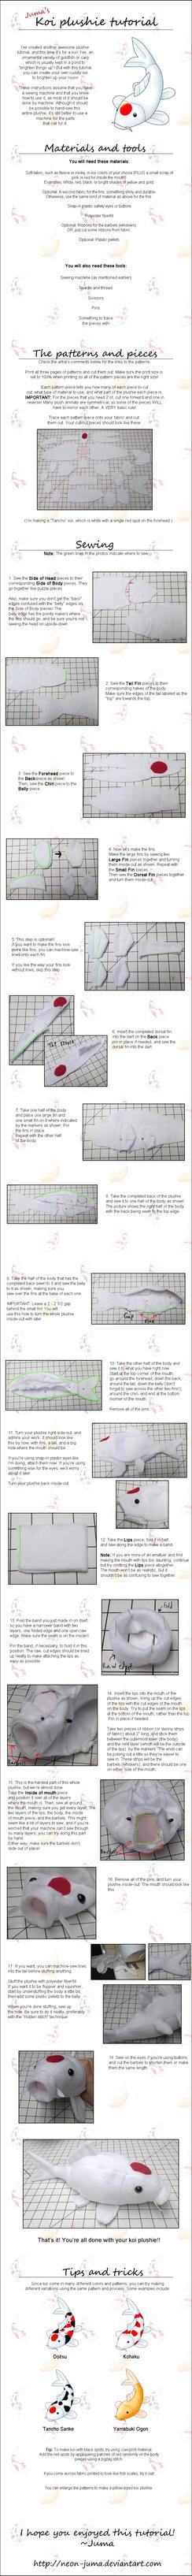 Koi plushie tutorial by Neon-Juma